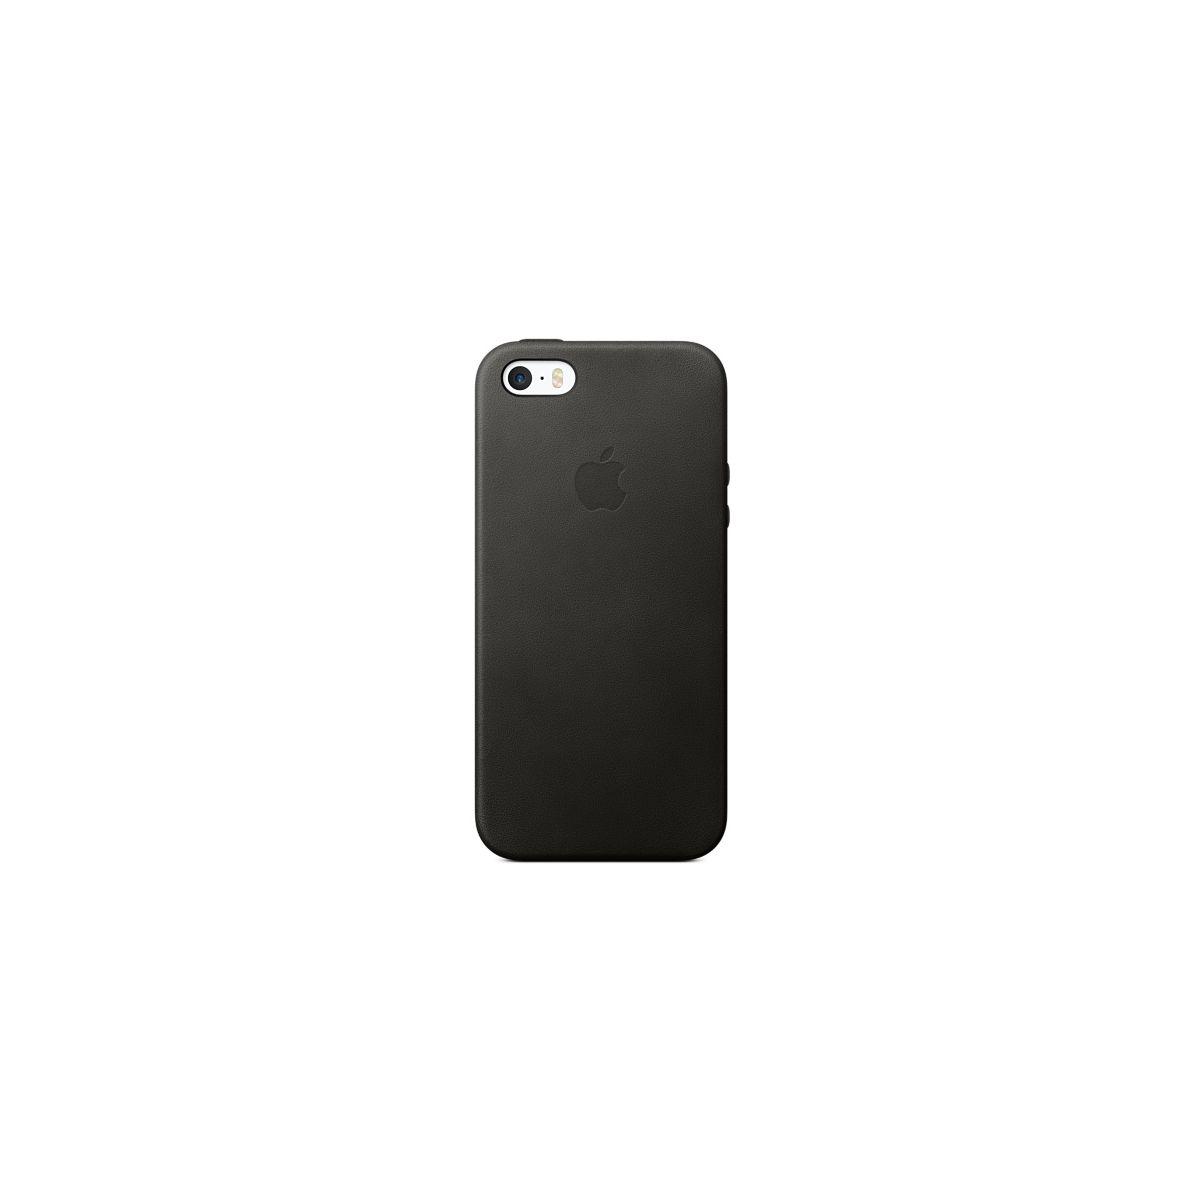 Coque APPLE cuir noir iPhone 5S/SE (photo)